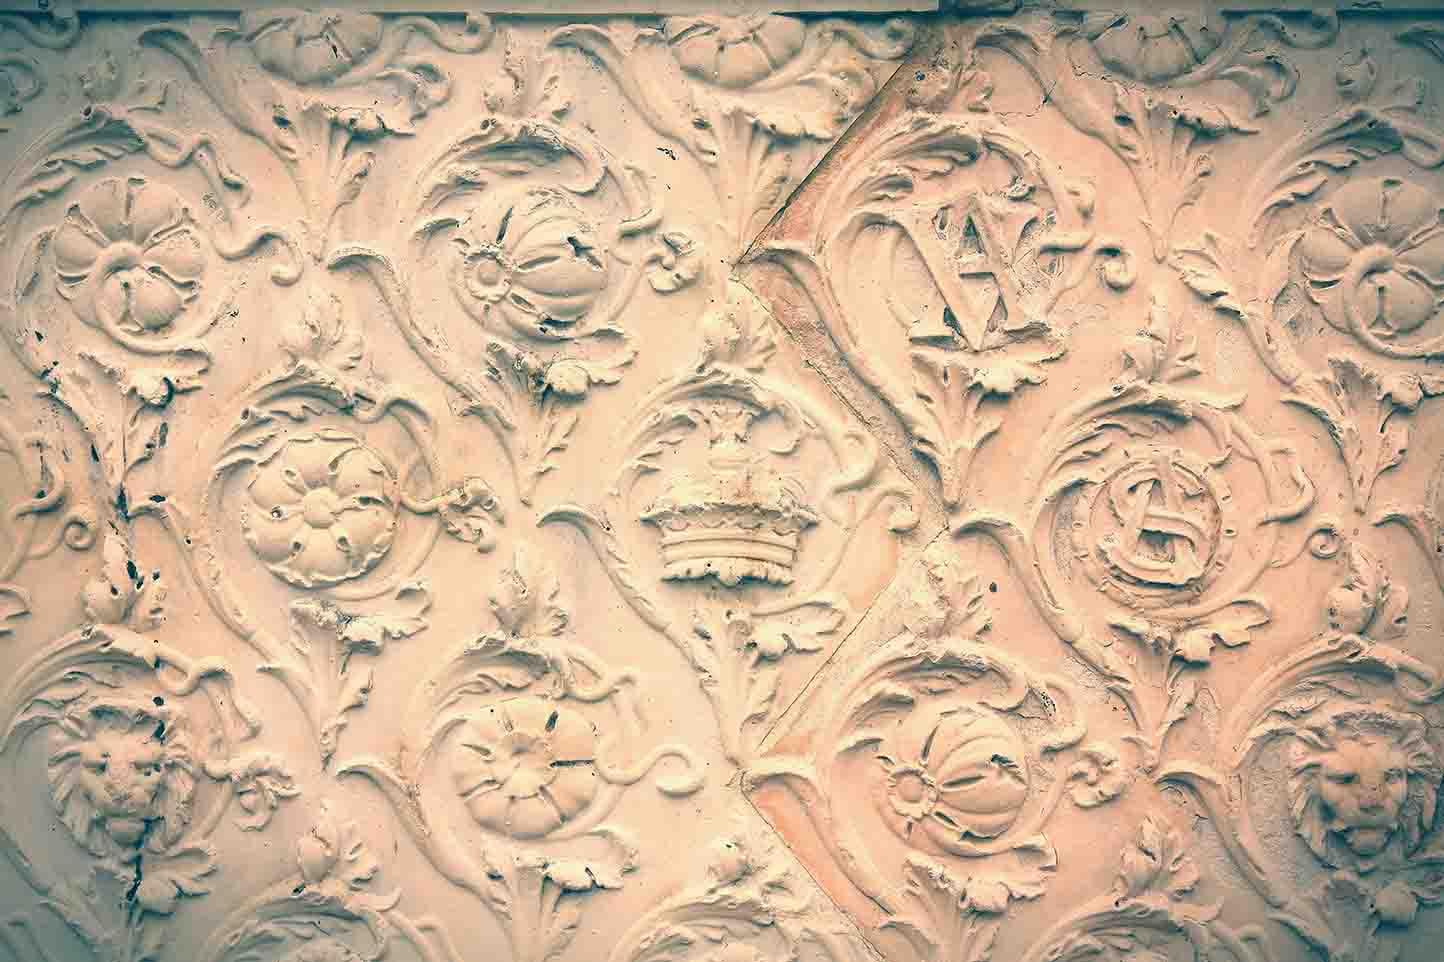 Texturizados de superfícies. Moda Vintage|VINTAGE